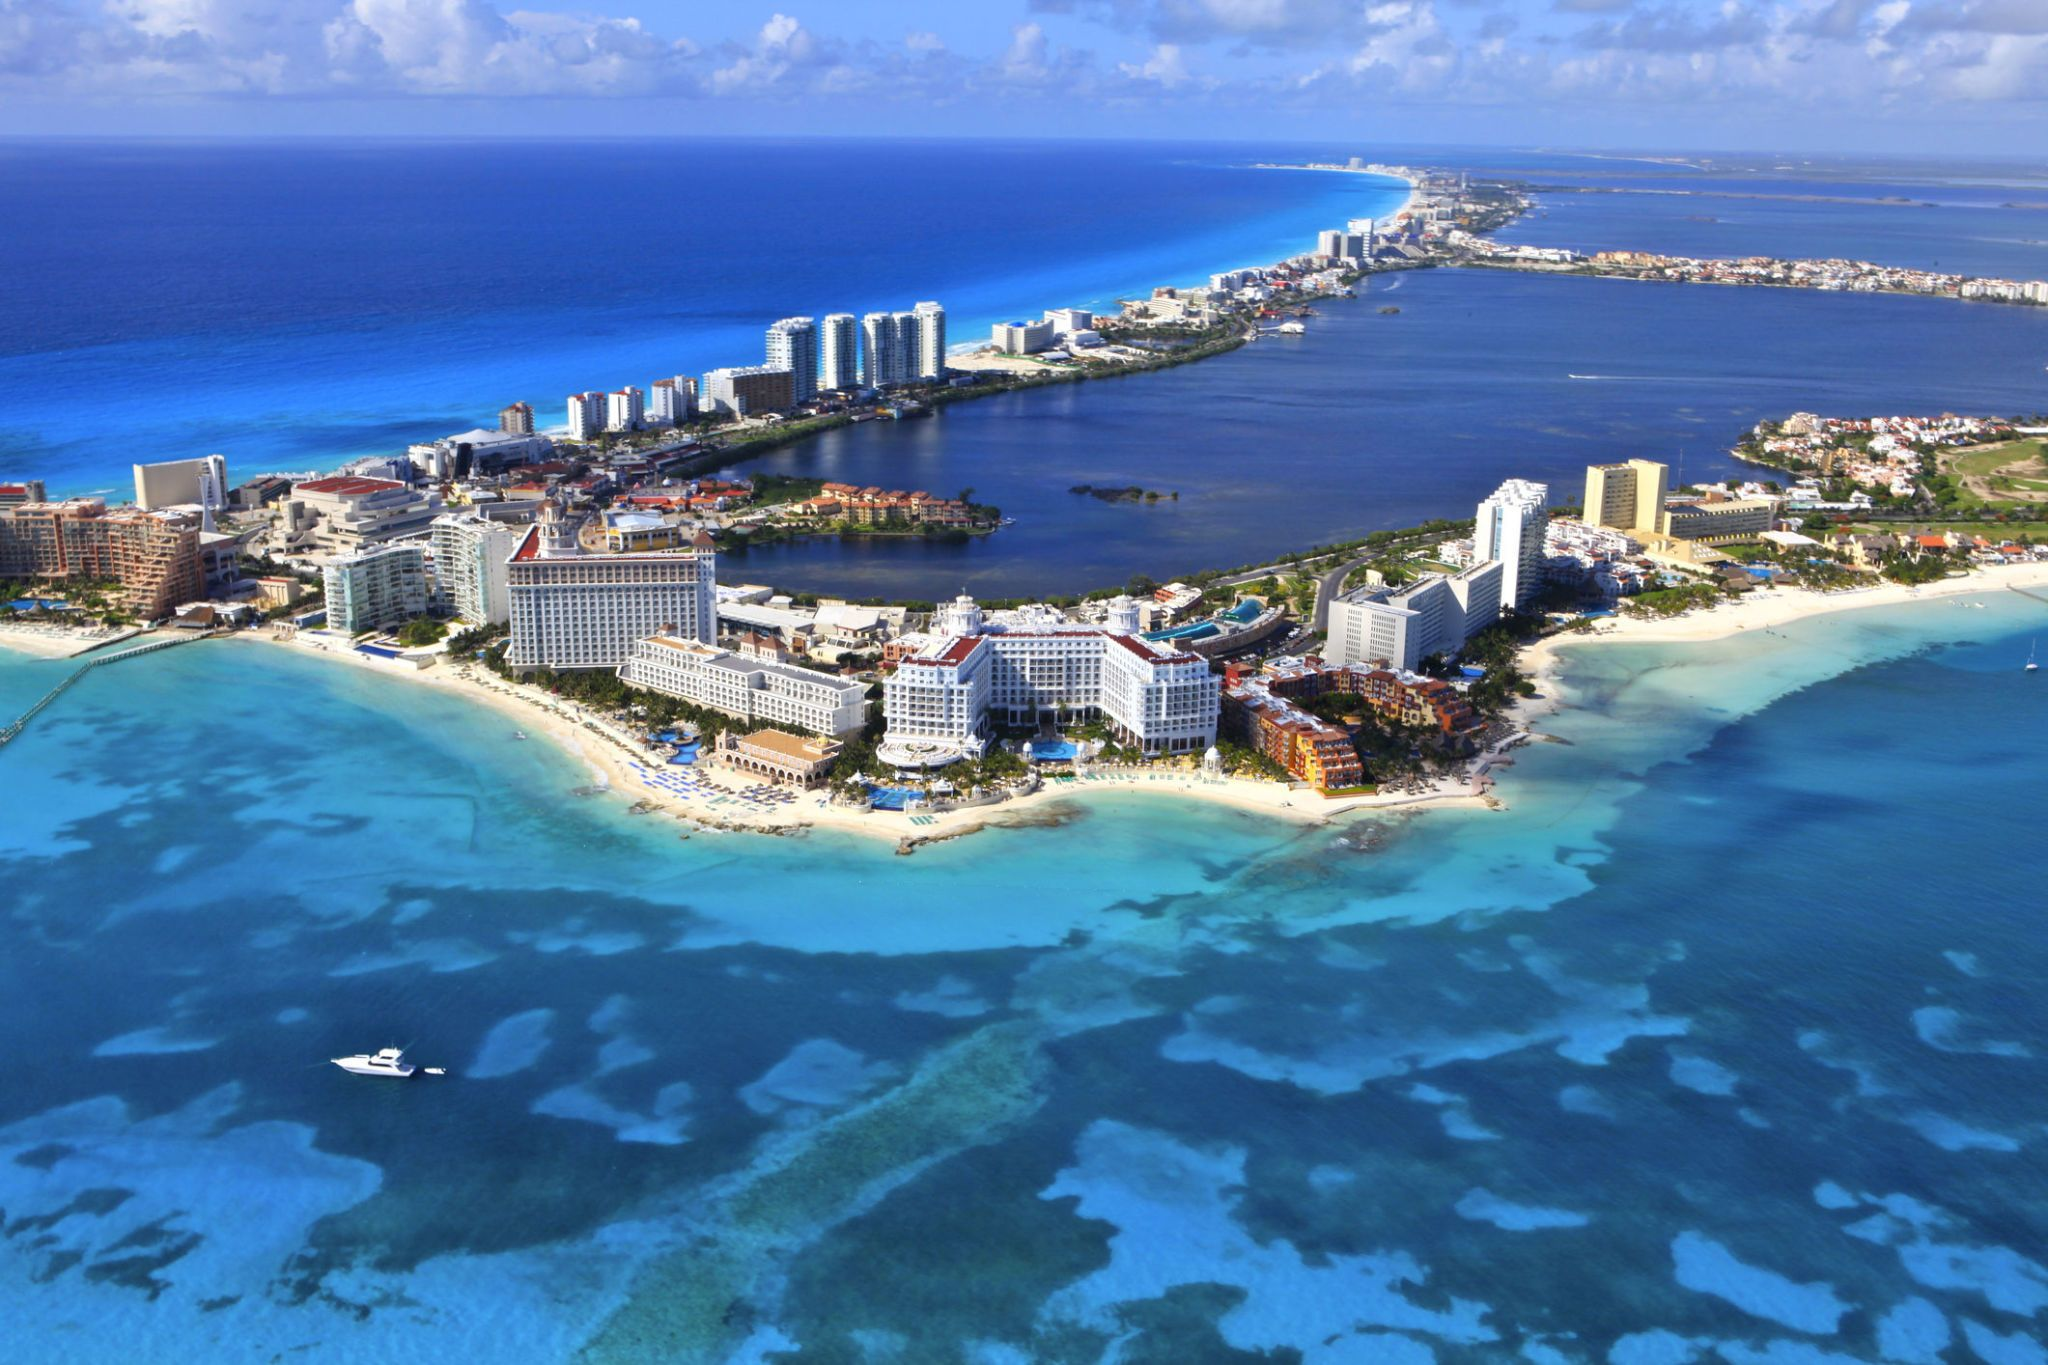 Incontri a Cancun Mexico